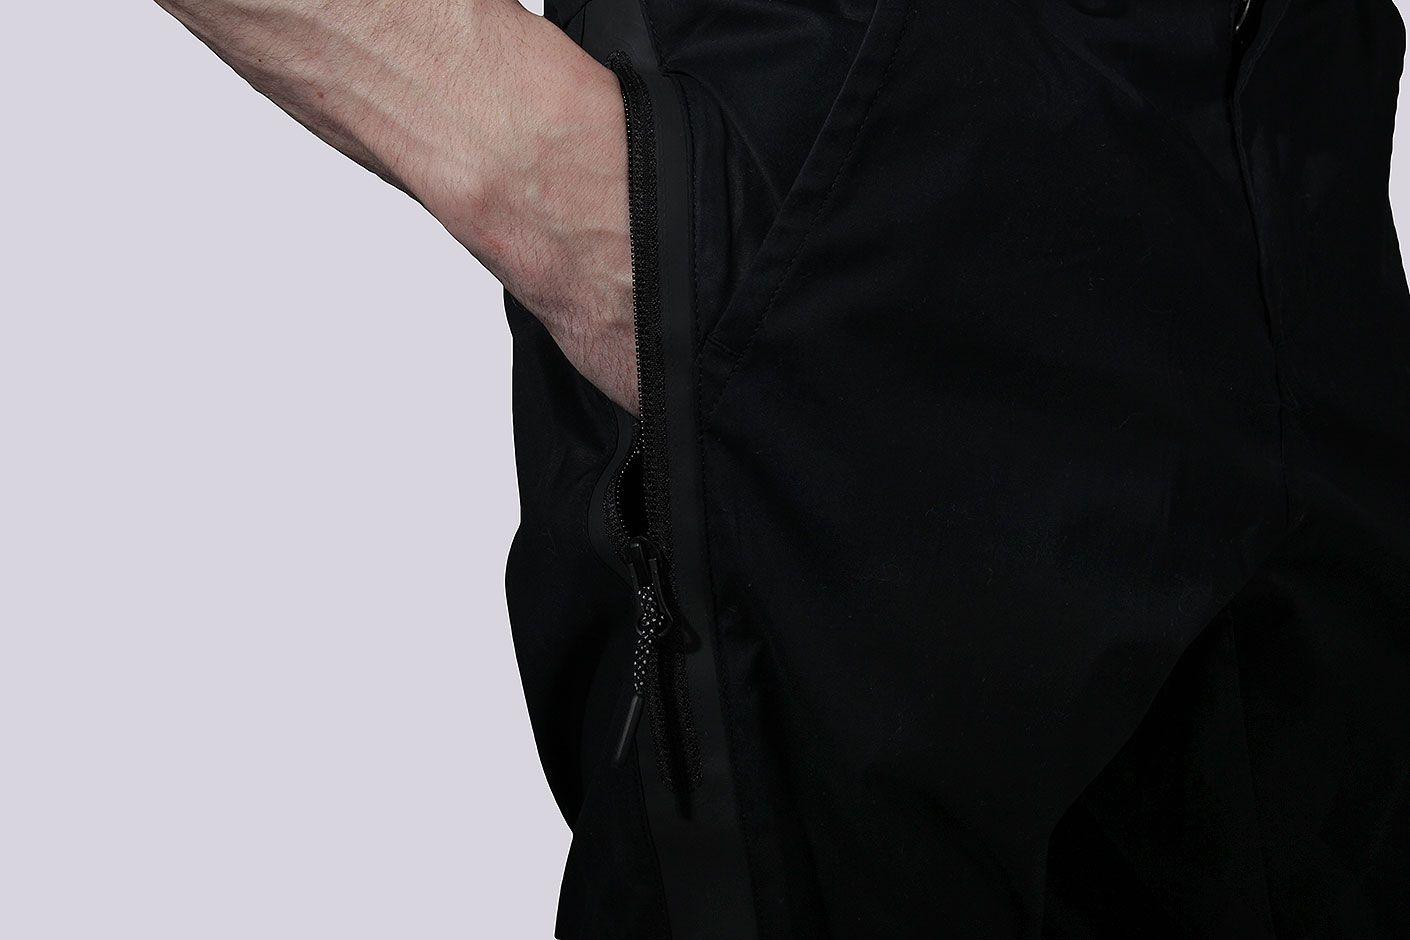 bdc6f0b80059 ... Мужские чёрные брюки Nike Bonded Jogger Pants - фото 3 картинки ...